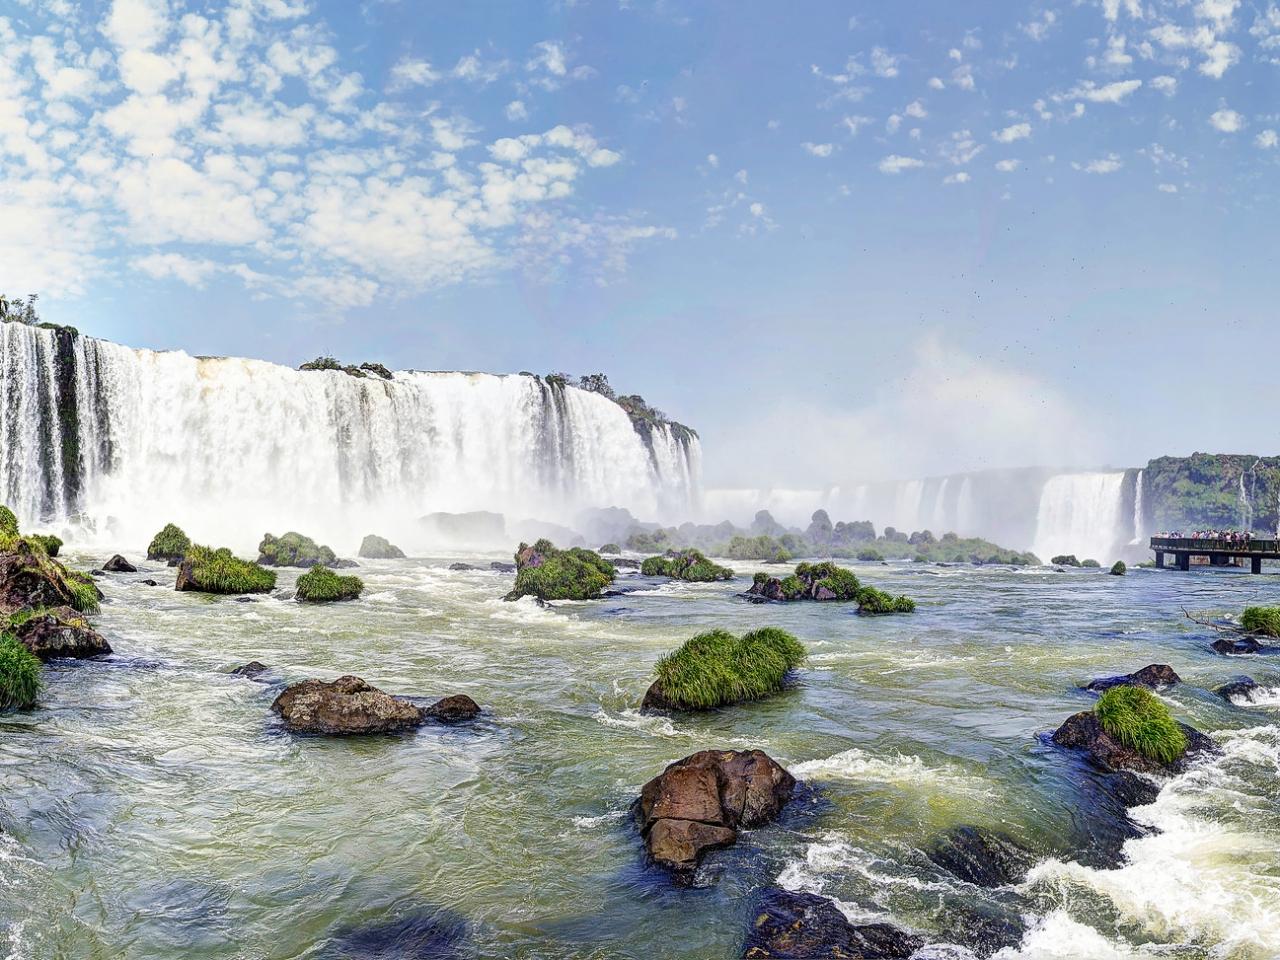 Cataratas de Iguazu - 1280x960